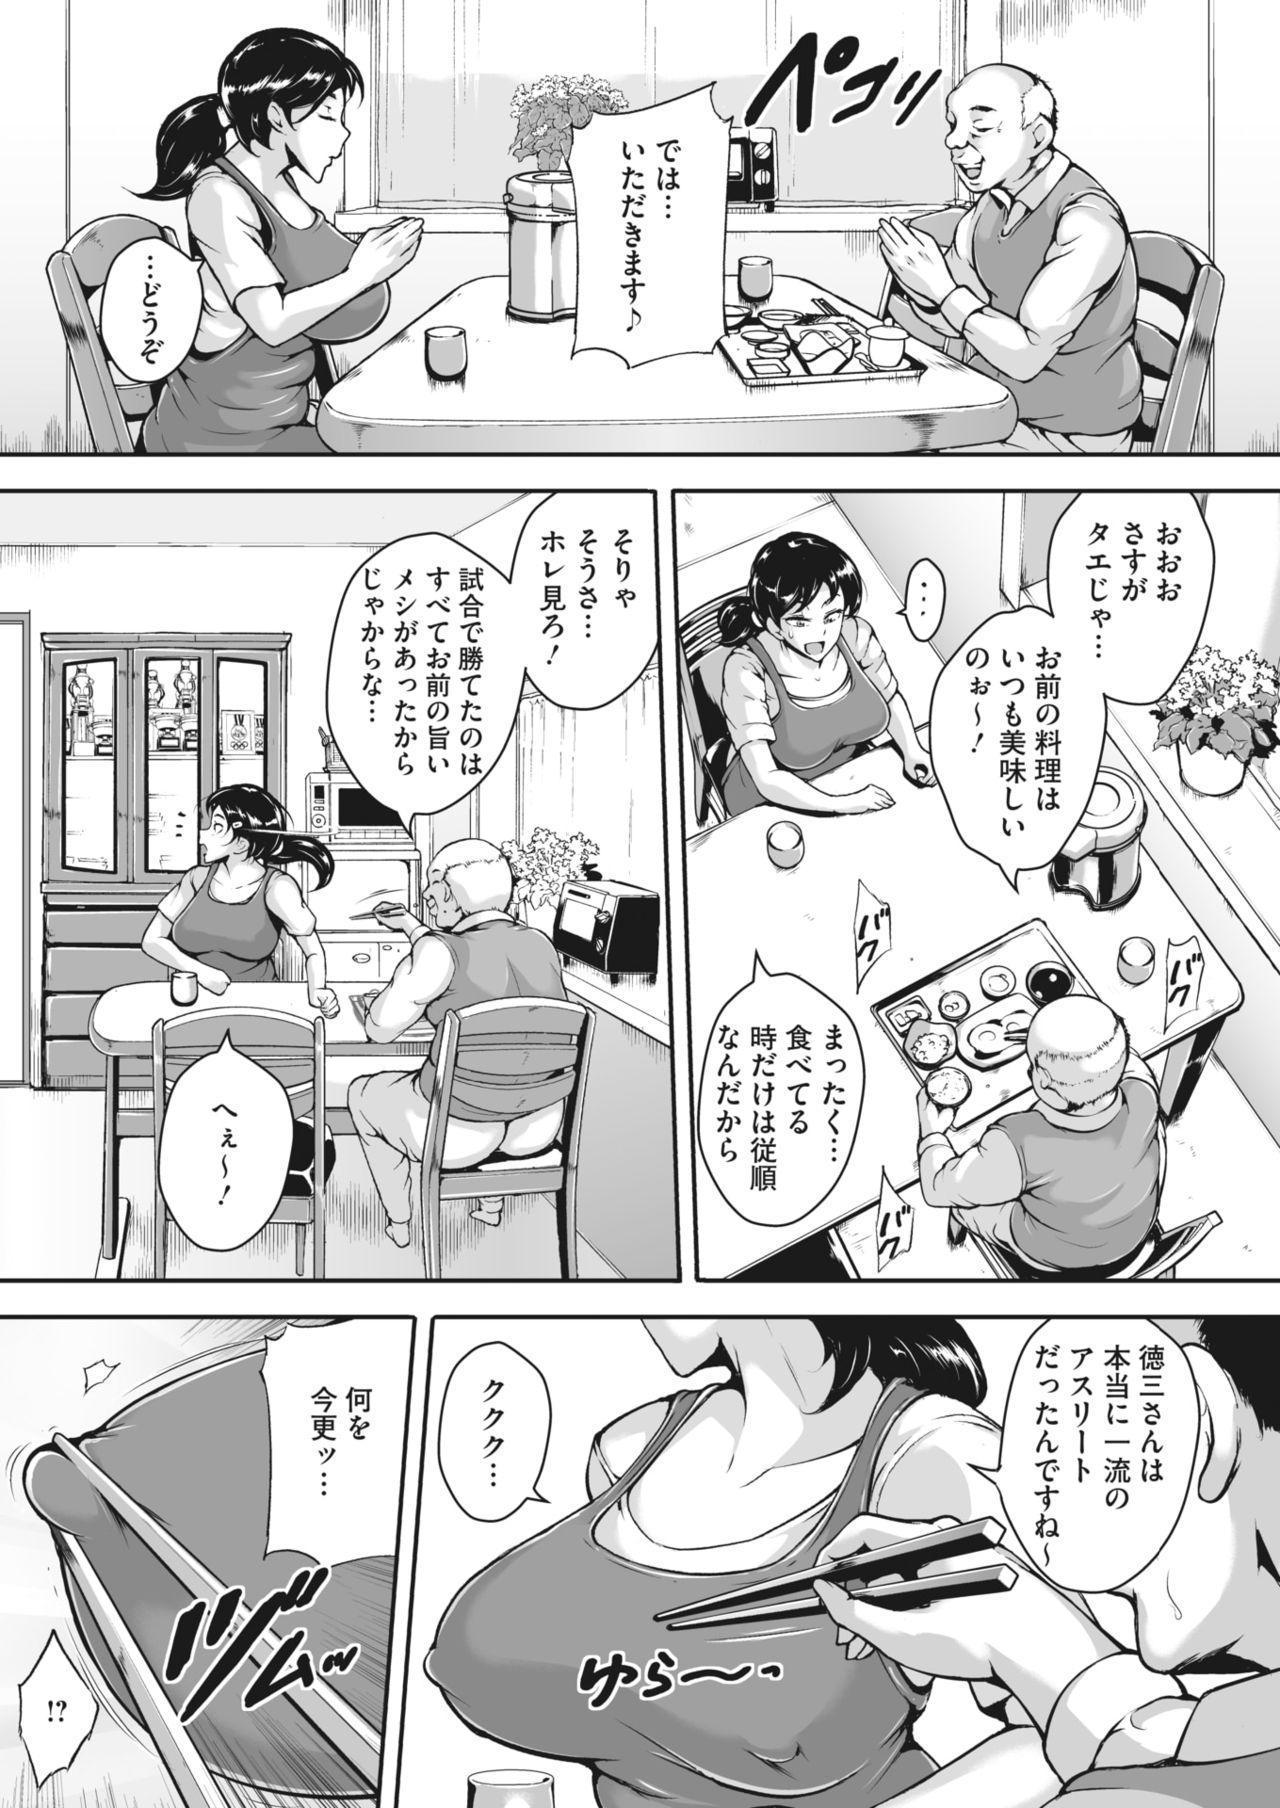 COMIC HOTMiLK Koime Vol. 22 53